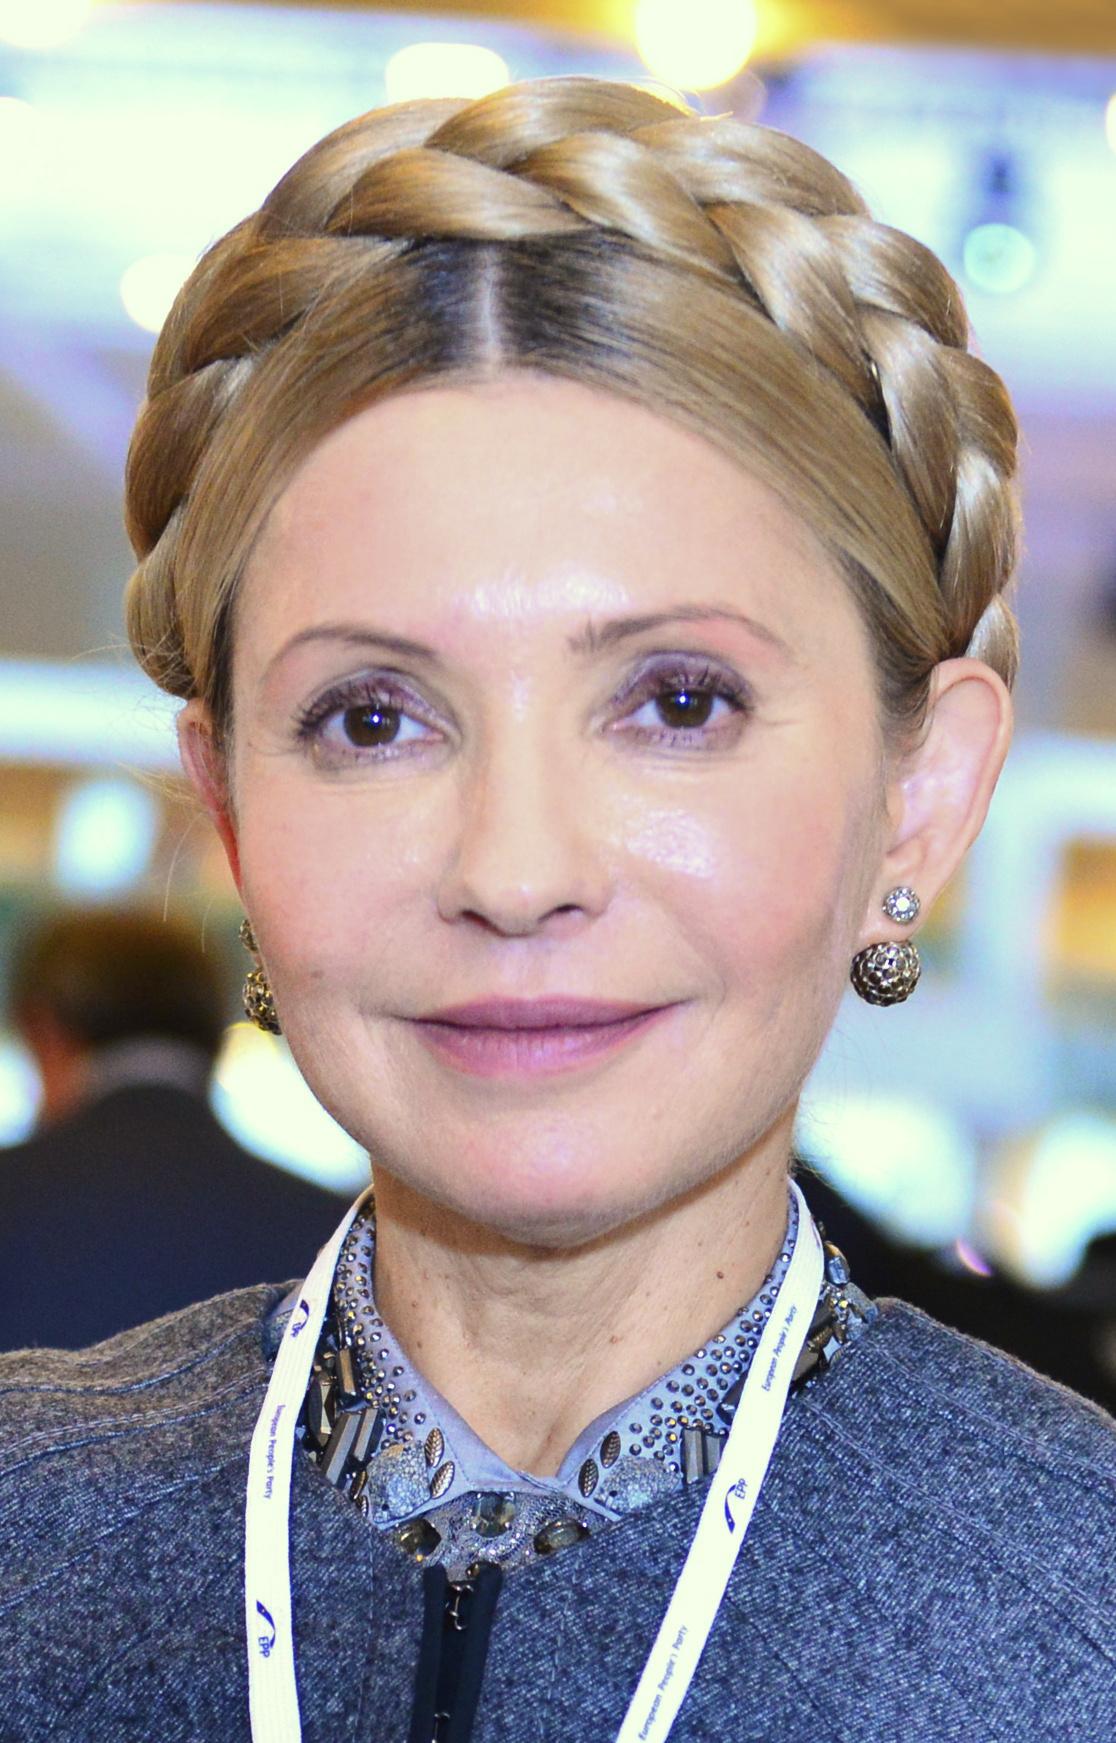 Yulia_Tymoshenko_2015.jpg